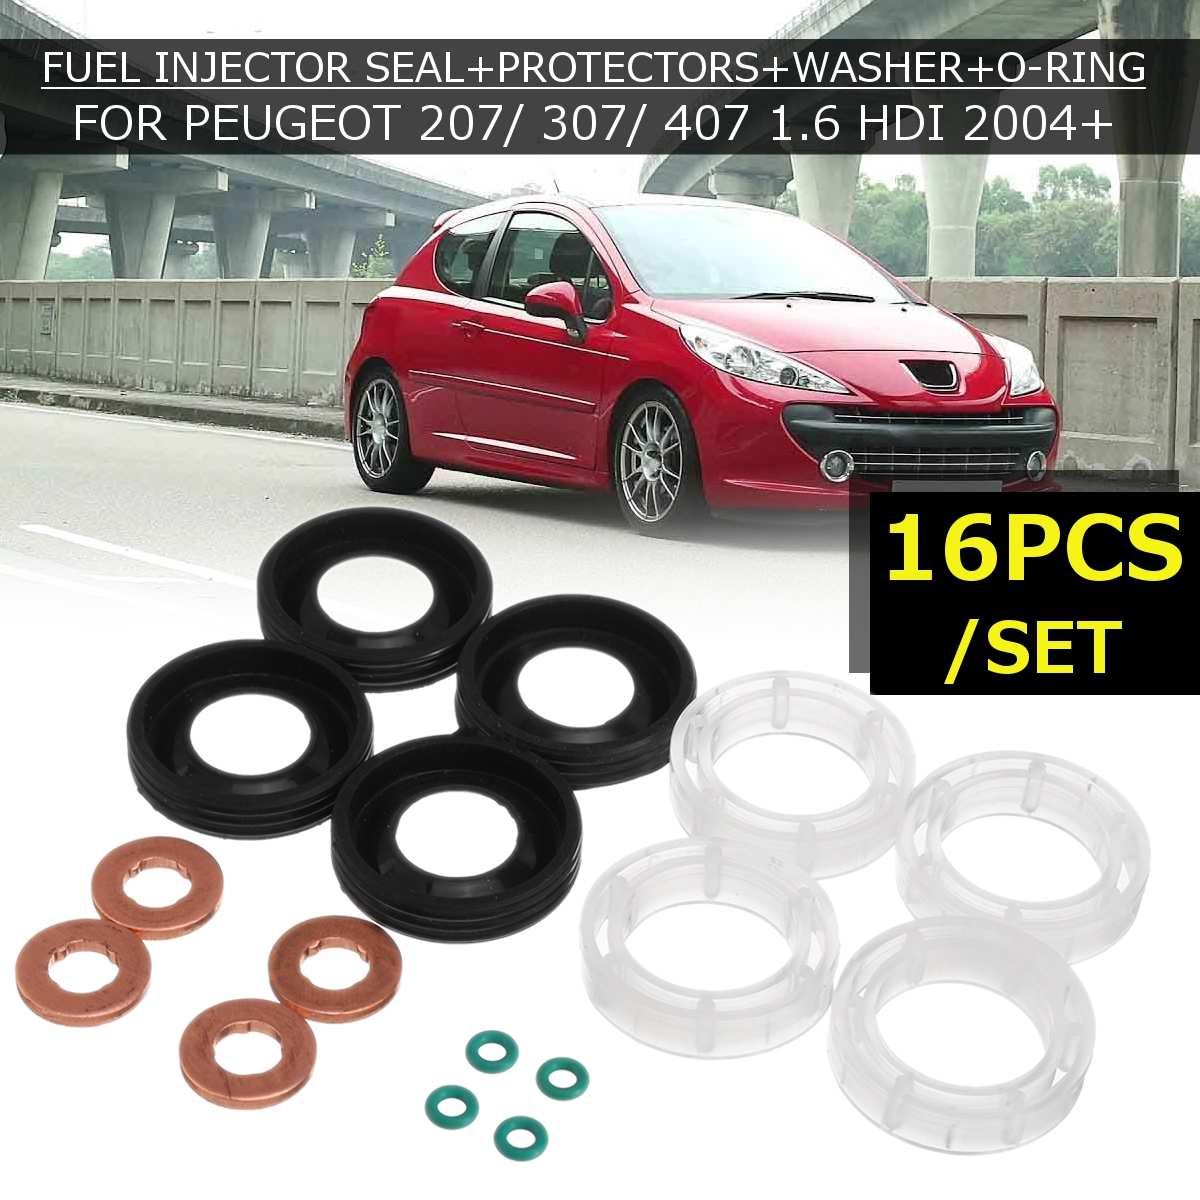 Coche 16 Uds sello inyector de combustible + protectores + lavadora + O-RING para PEUGEOT 207/307/407 1,6 HDI 2004 198299 de coche